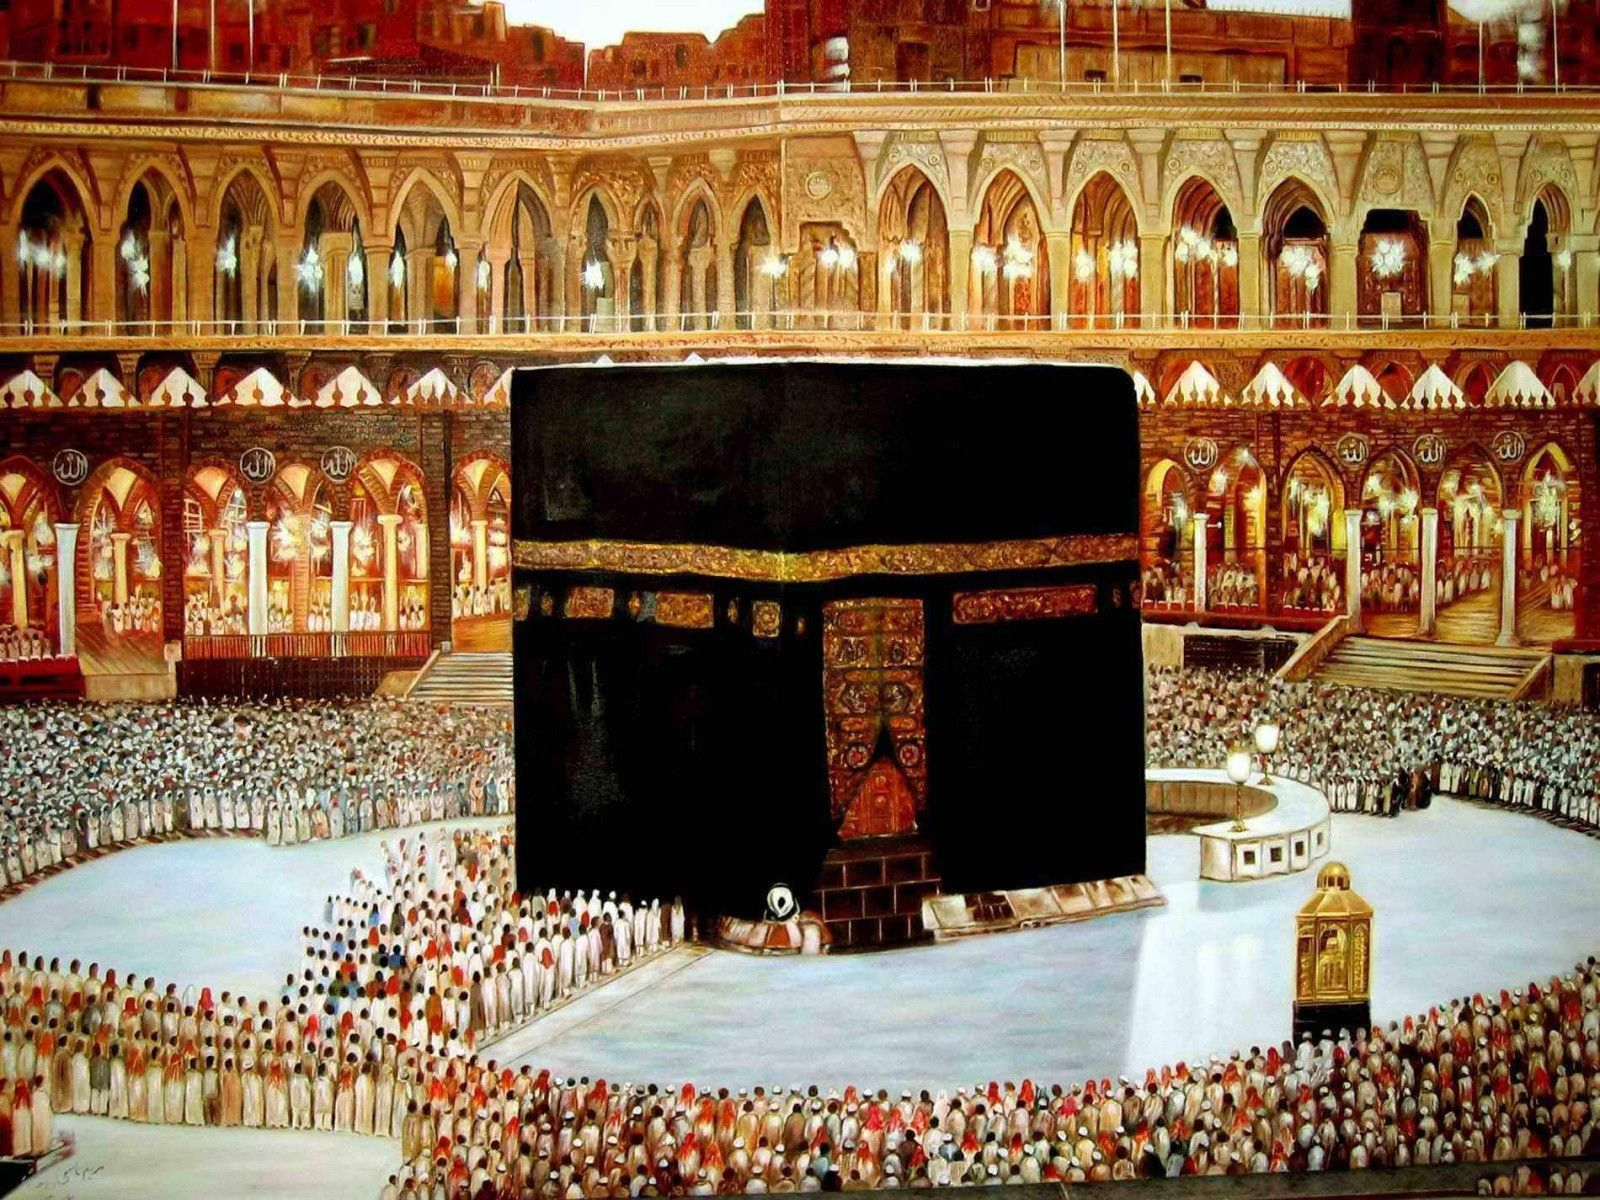 Mecca Sharif Wallpapers Hd Wallpaperswindows 8 Hq Wallpapers Mecca Wallpaper Khana Kaba Mecca